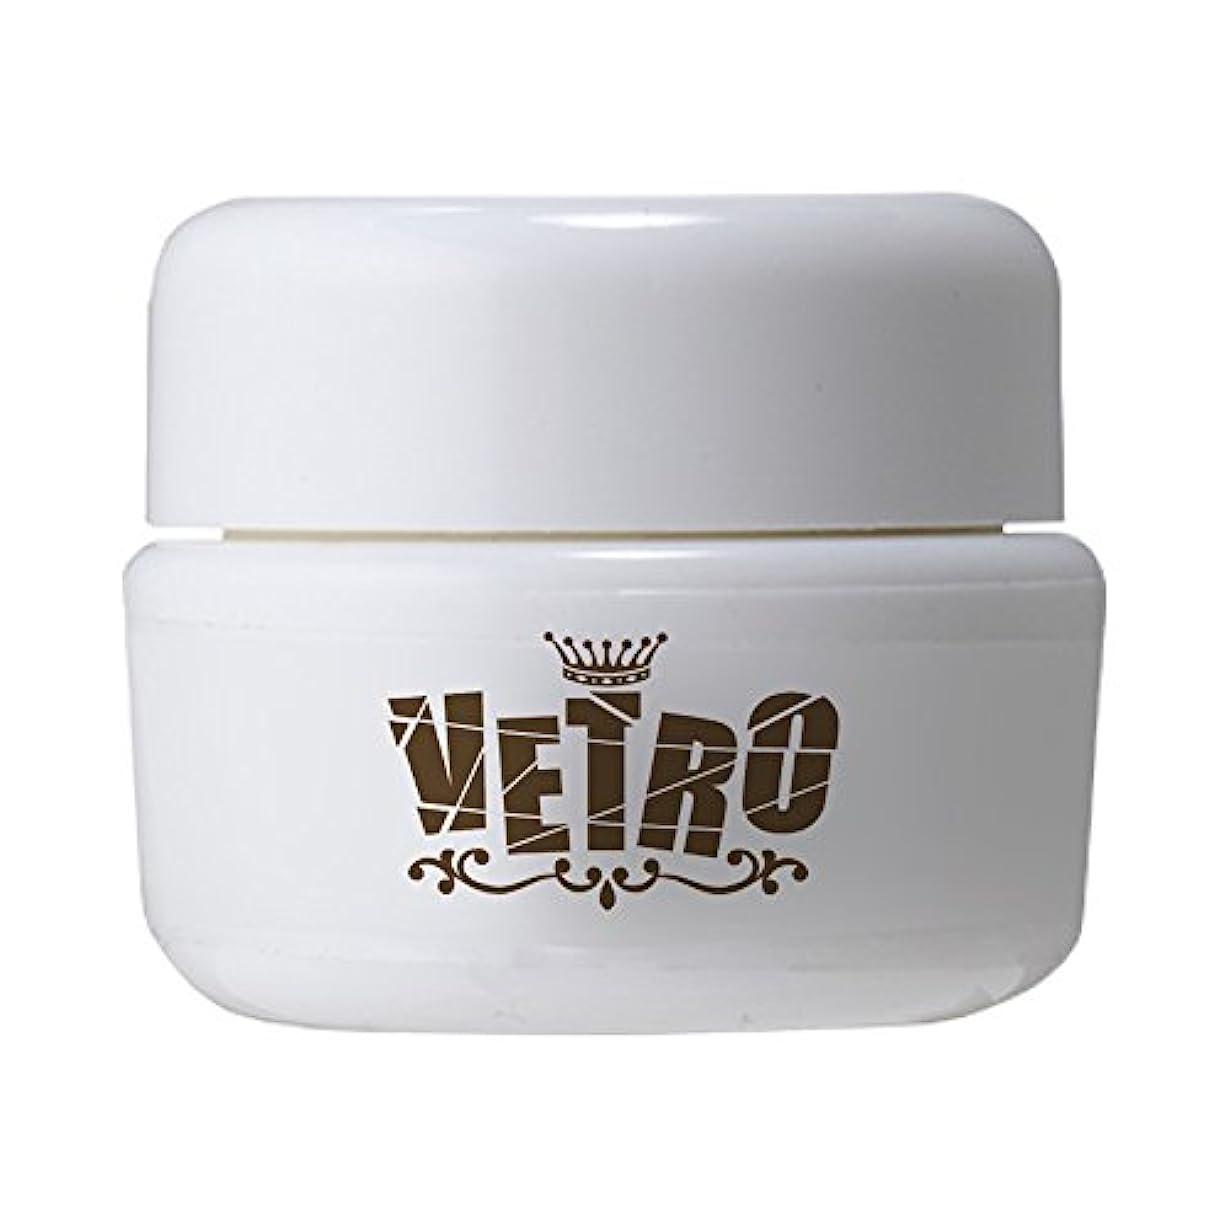 VETRO No.19 カラージェル マット VL127 シーグリーン 4ml